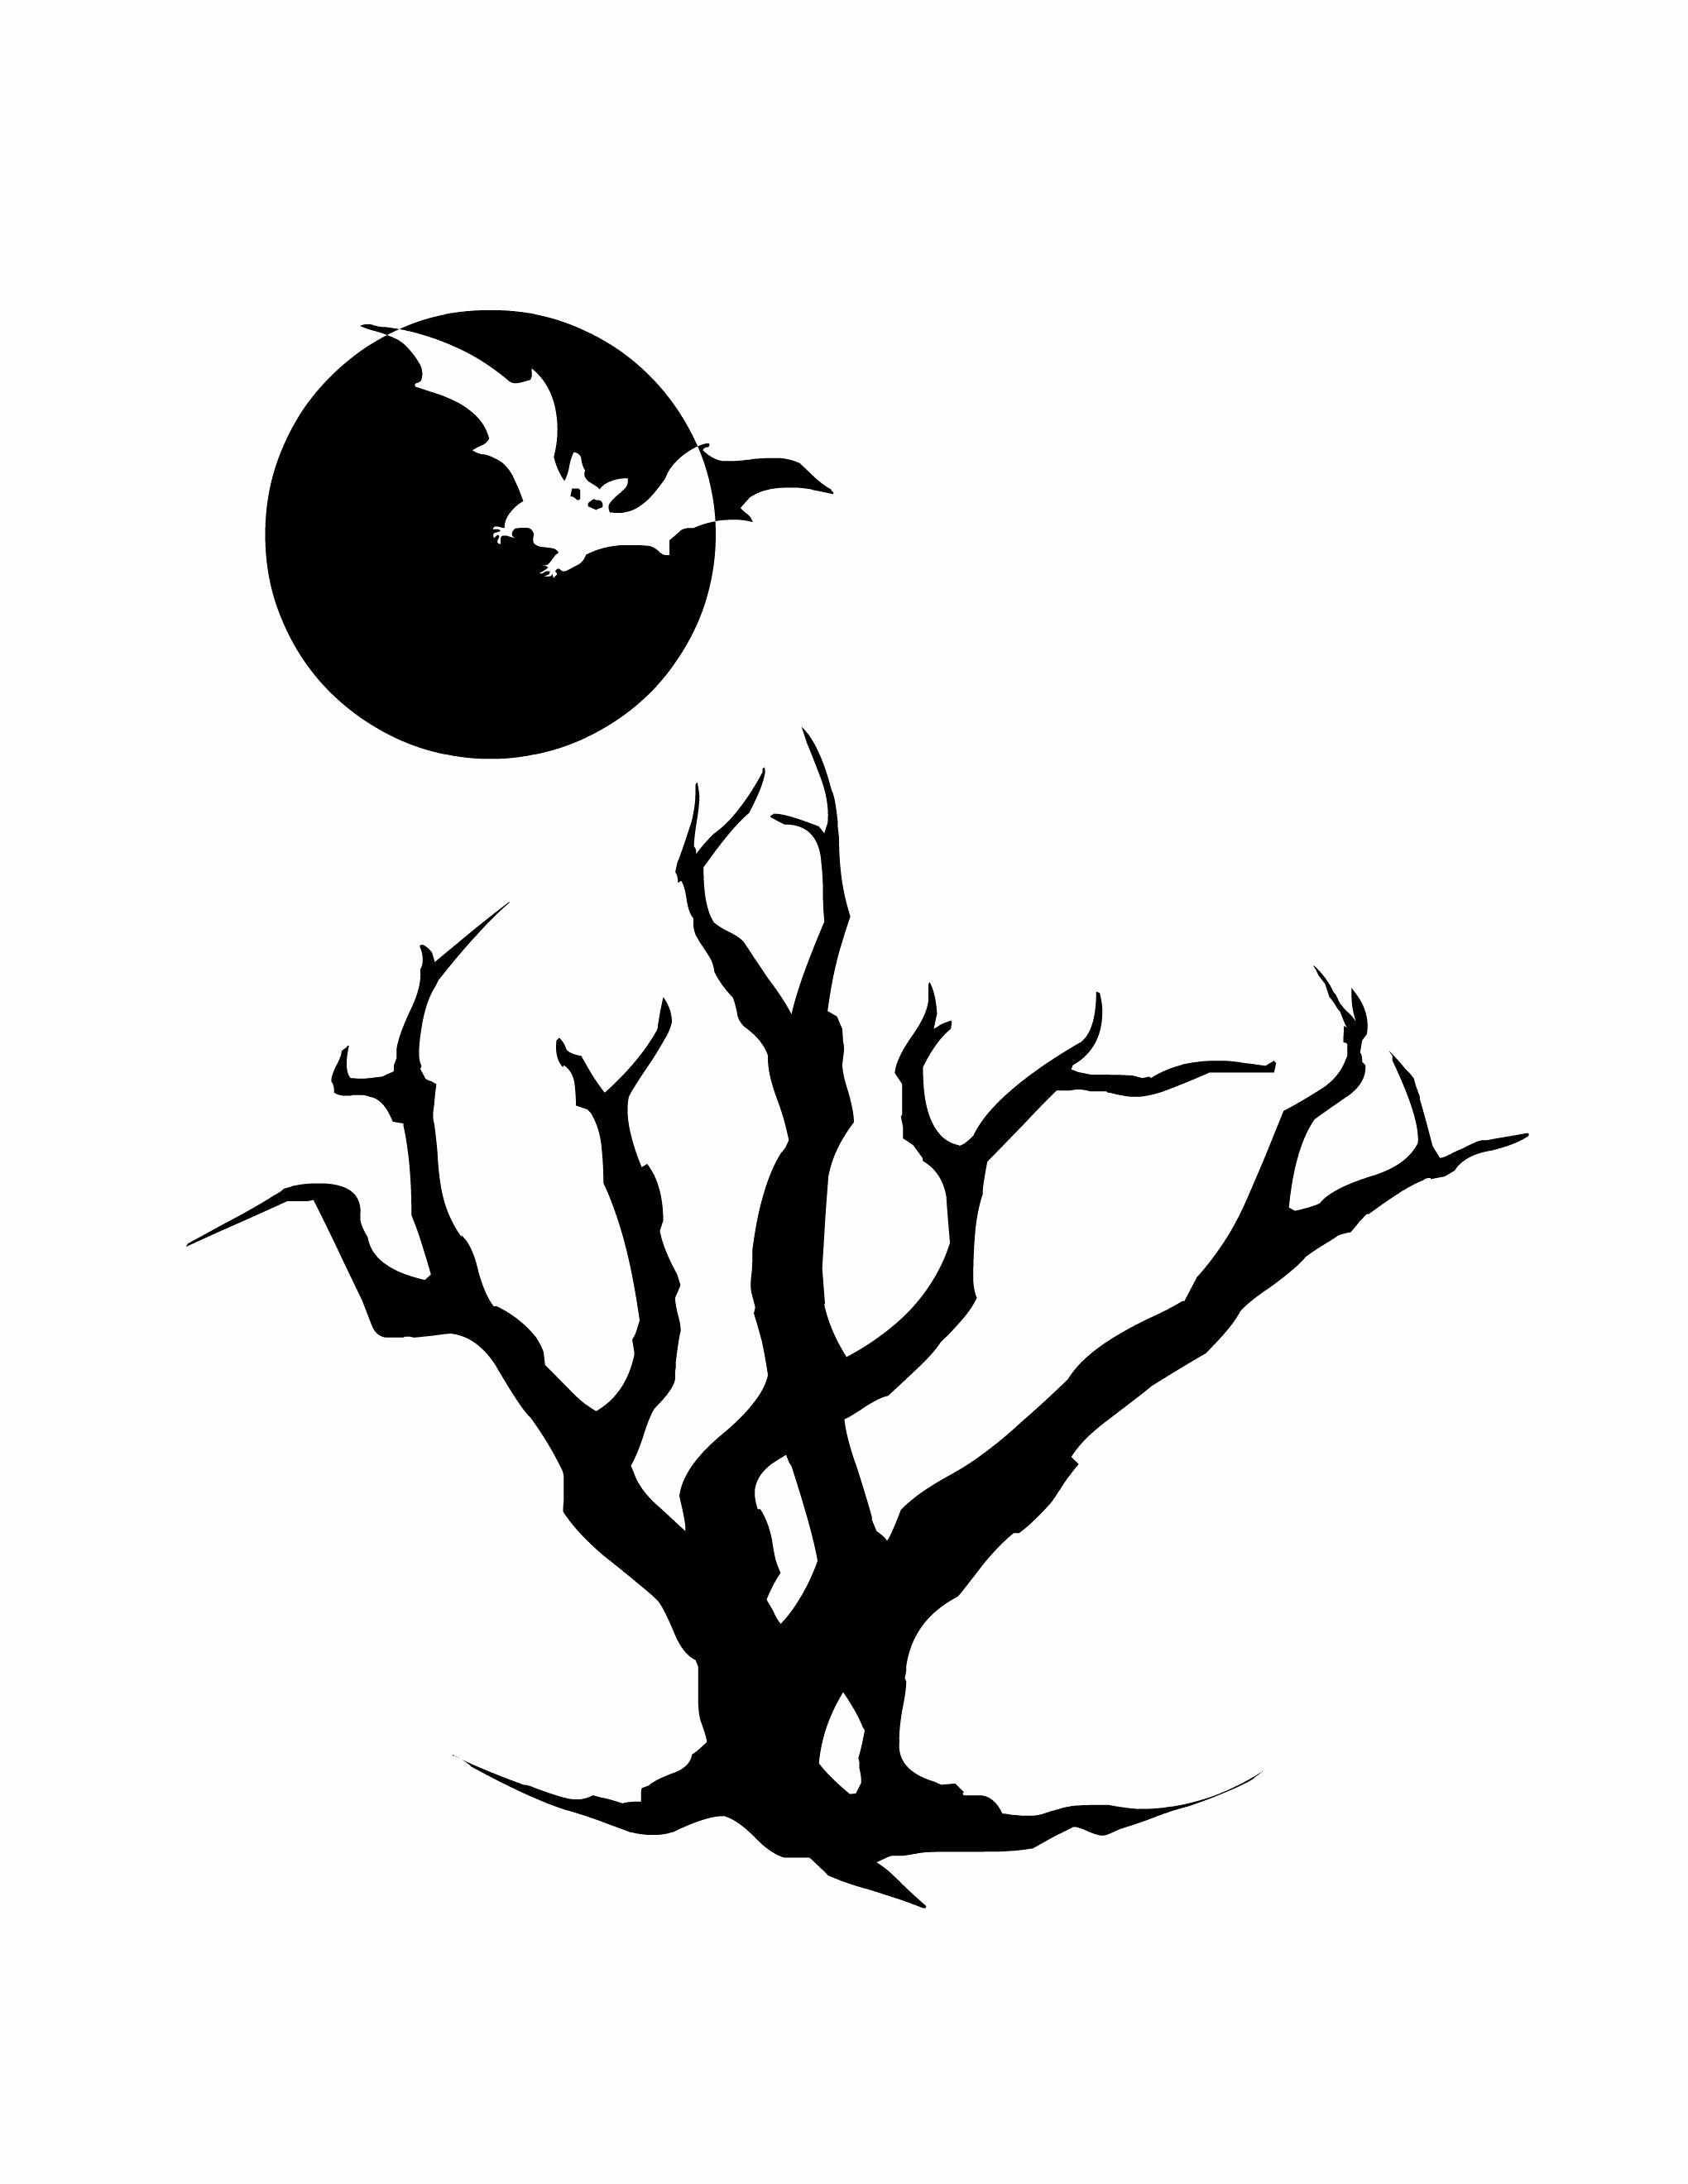 2040x2640 Halloween Template Lovely Printable Halloween Silhouettes